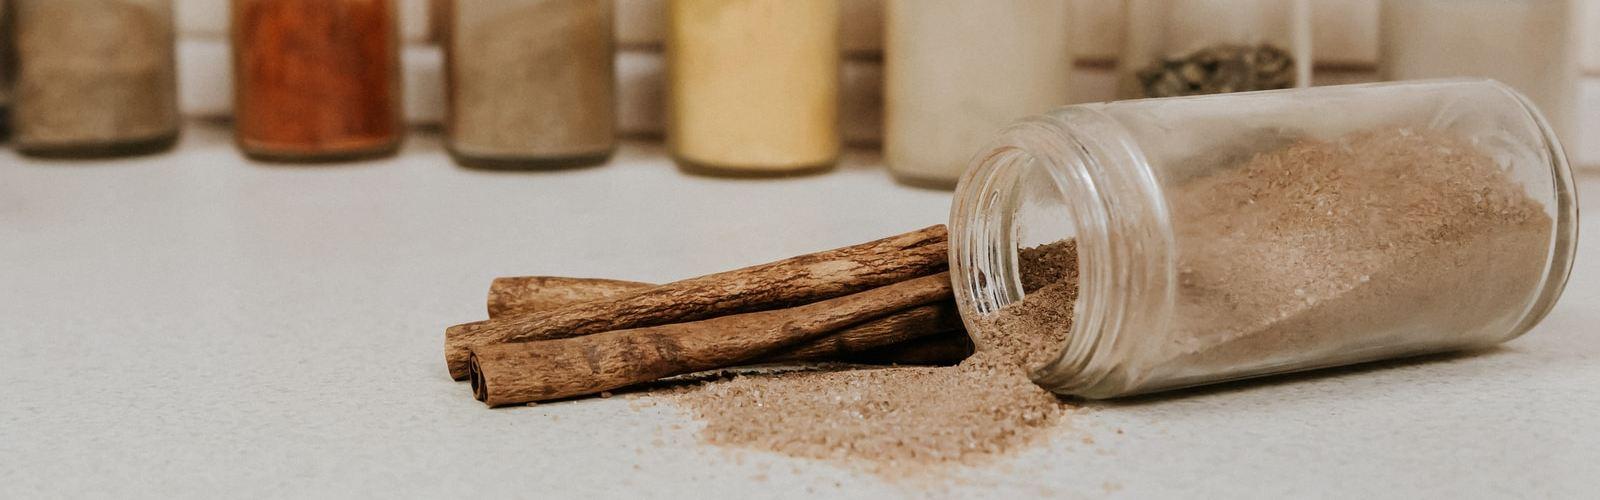 cinnamon for pcos